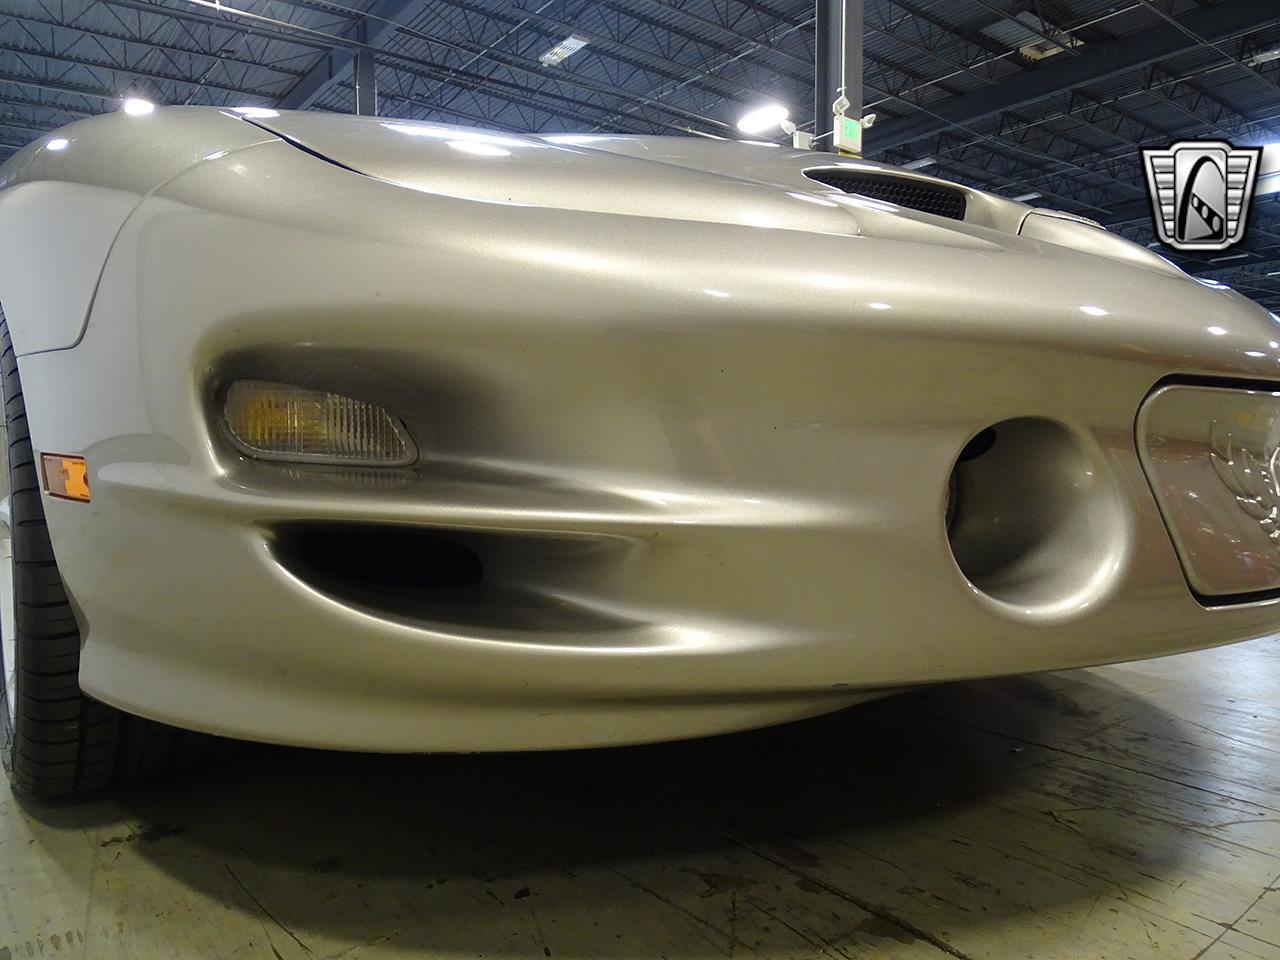 2002 Pontiac Firebird Trans Am (CC-1358923) for sale in O'Fallon, Illinois